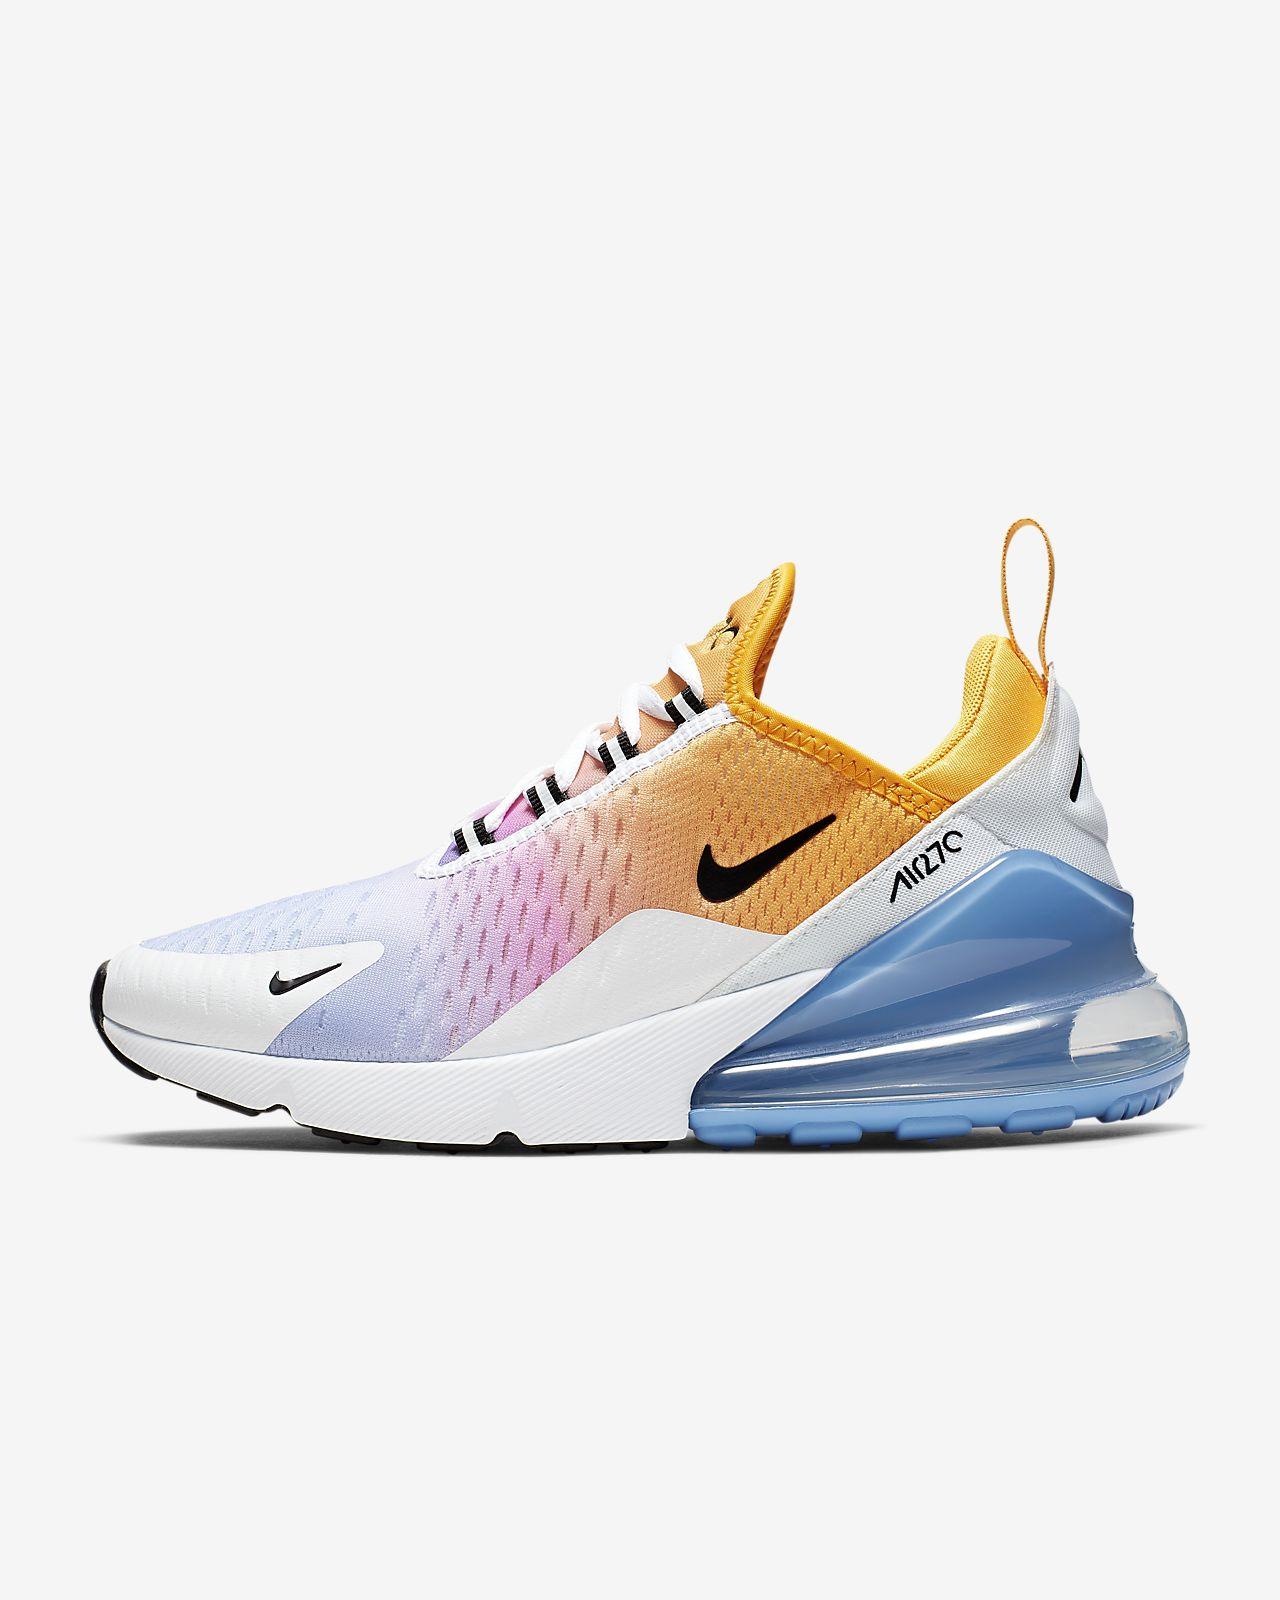 1af51a8e85 Nike Air Max 270 Women's Shoe